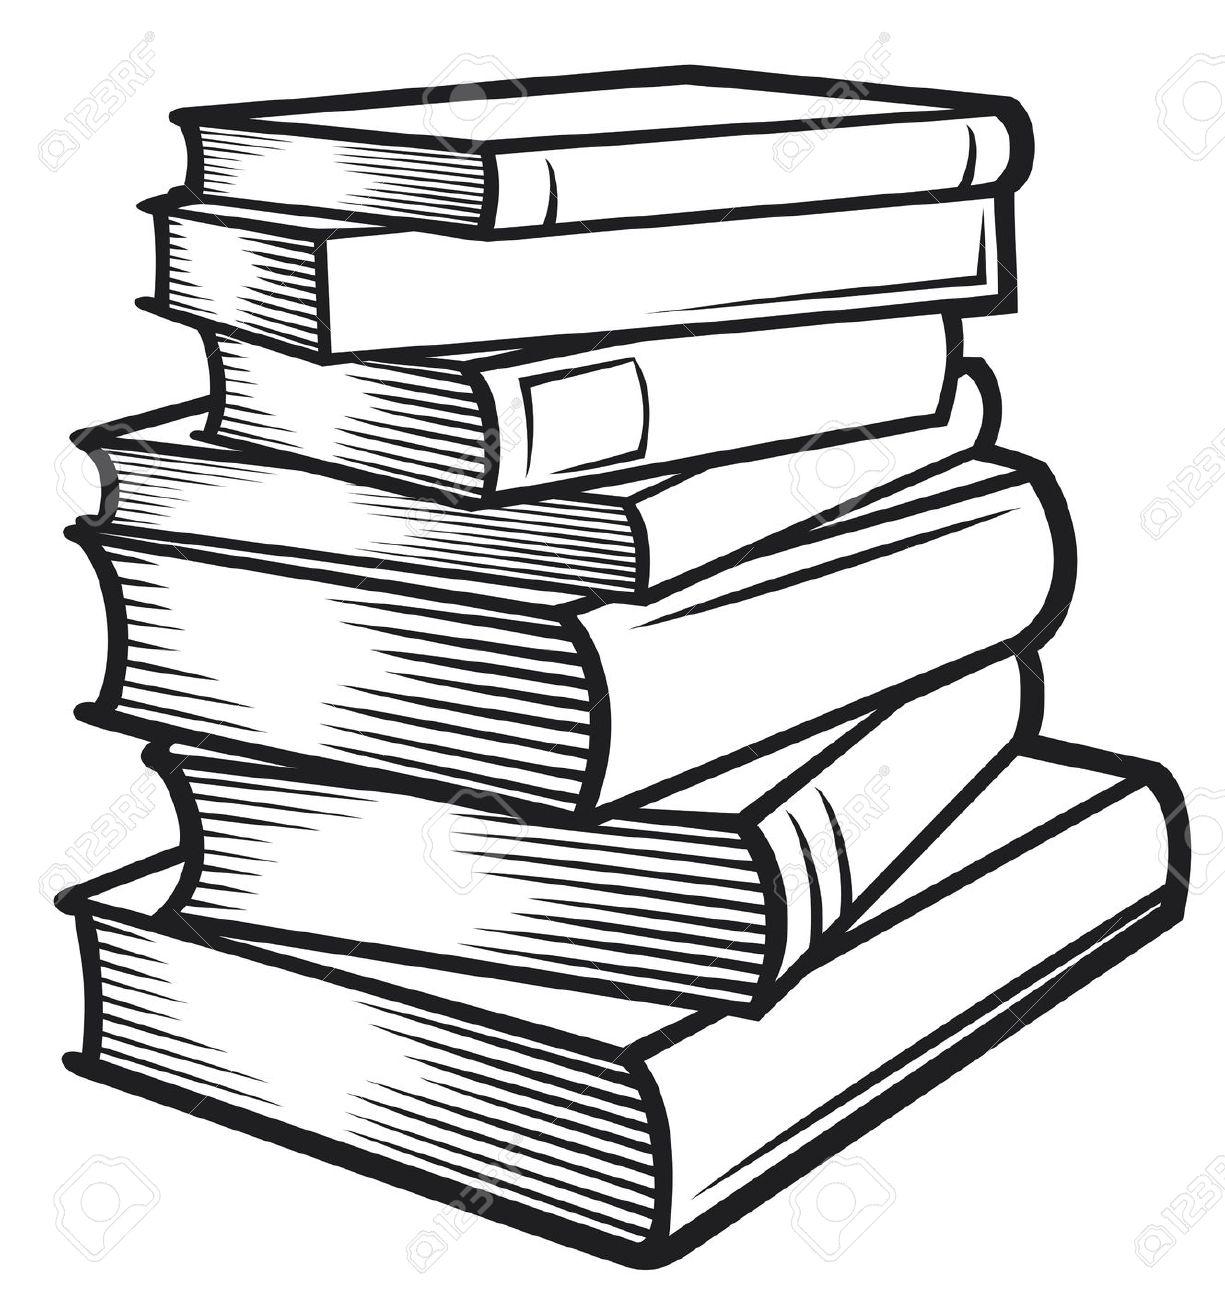 1225x1300 Stack Of Books Clip Art Books Clip Art Image Black